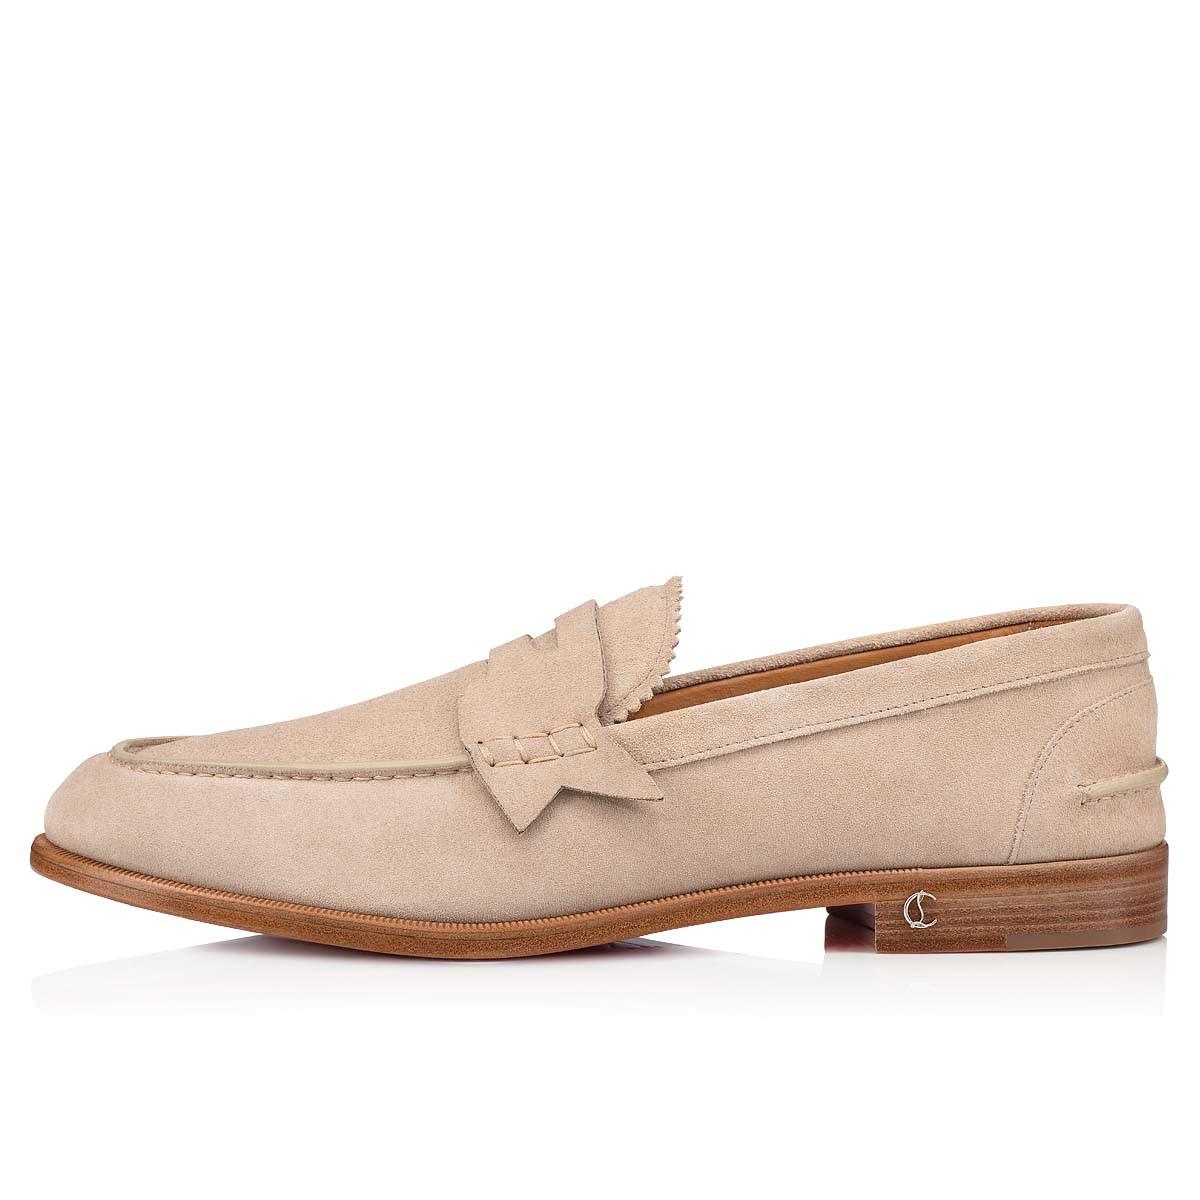 Shoes - No Penny - Christian Louboutin